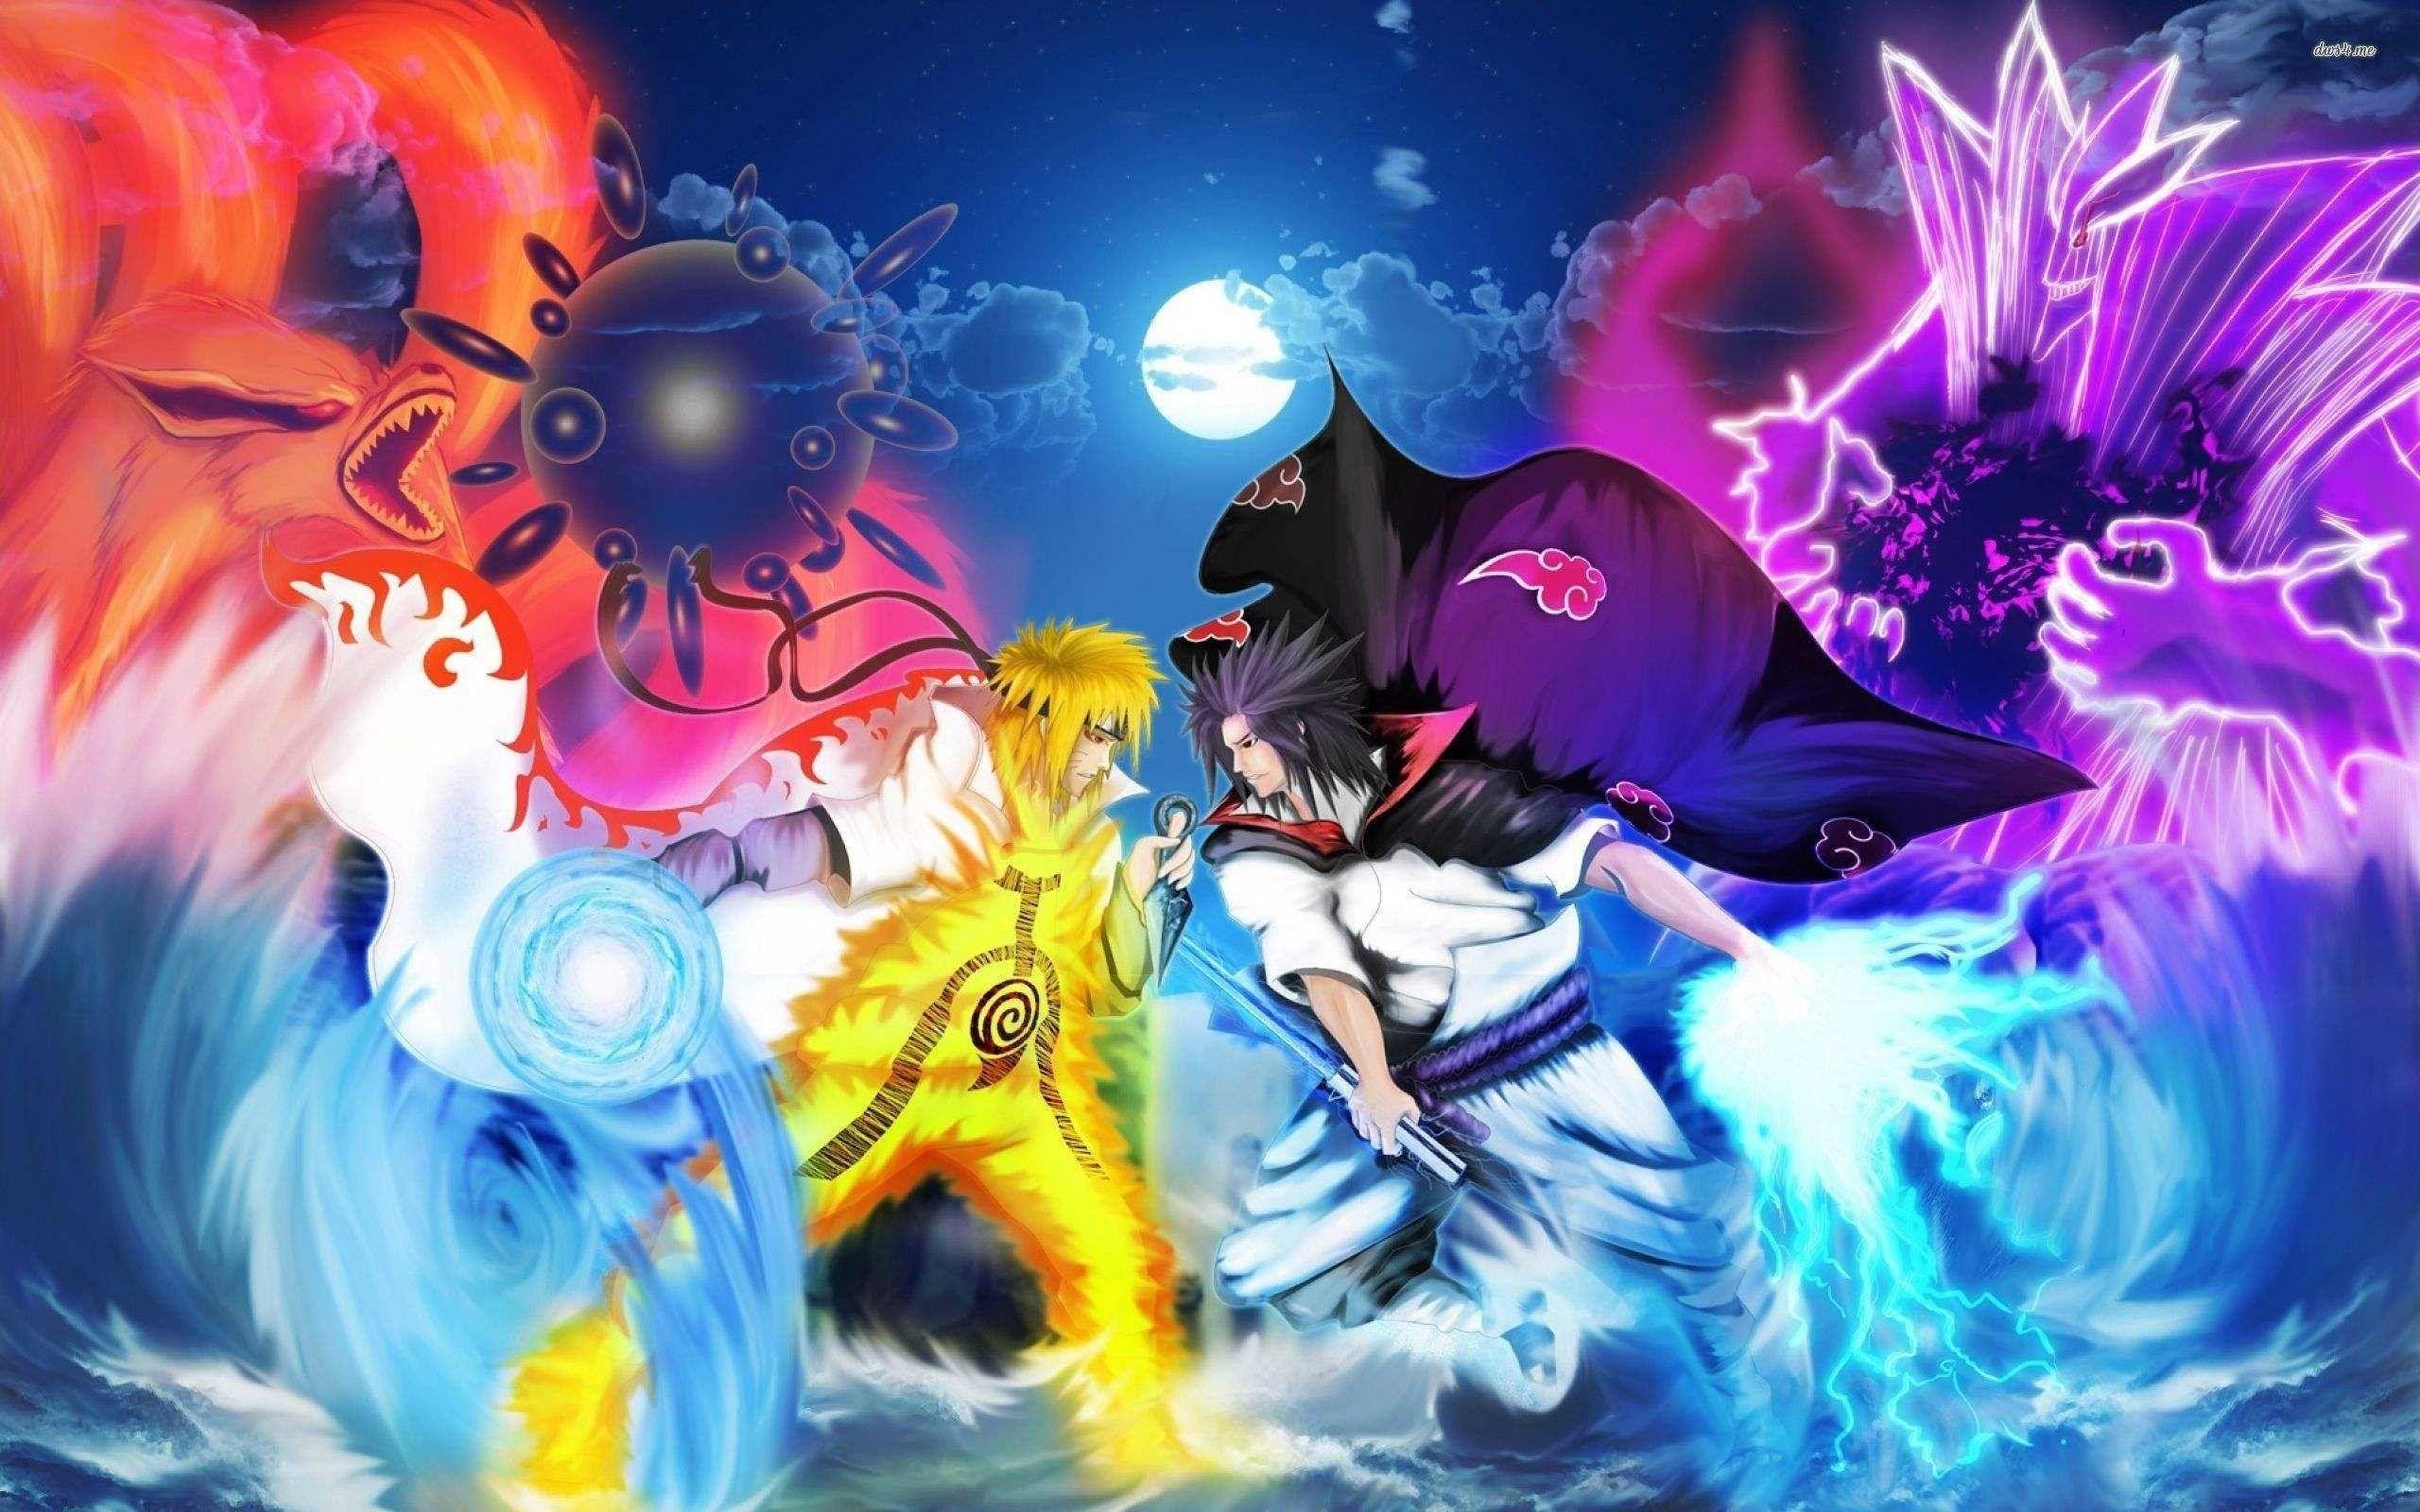 80 Naruto 1080p Wallpapers On Wallpaperplay Di 2020 Dengan